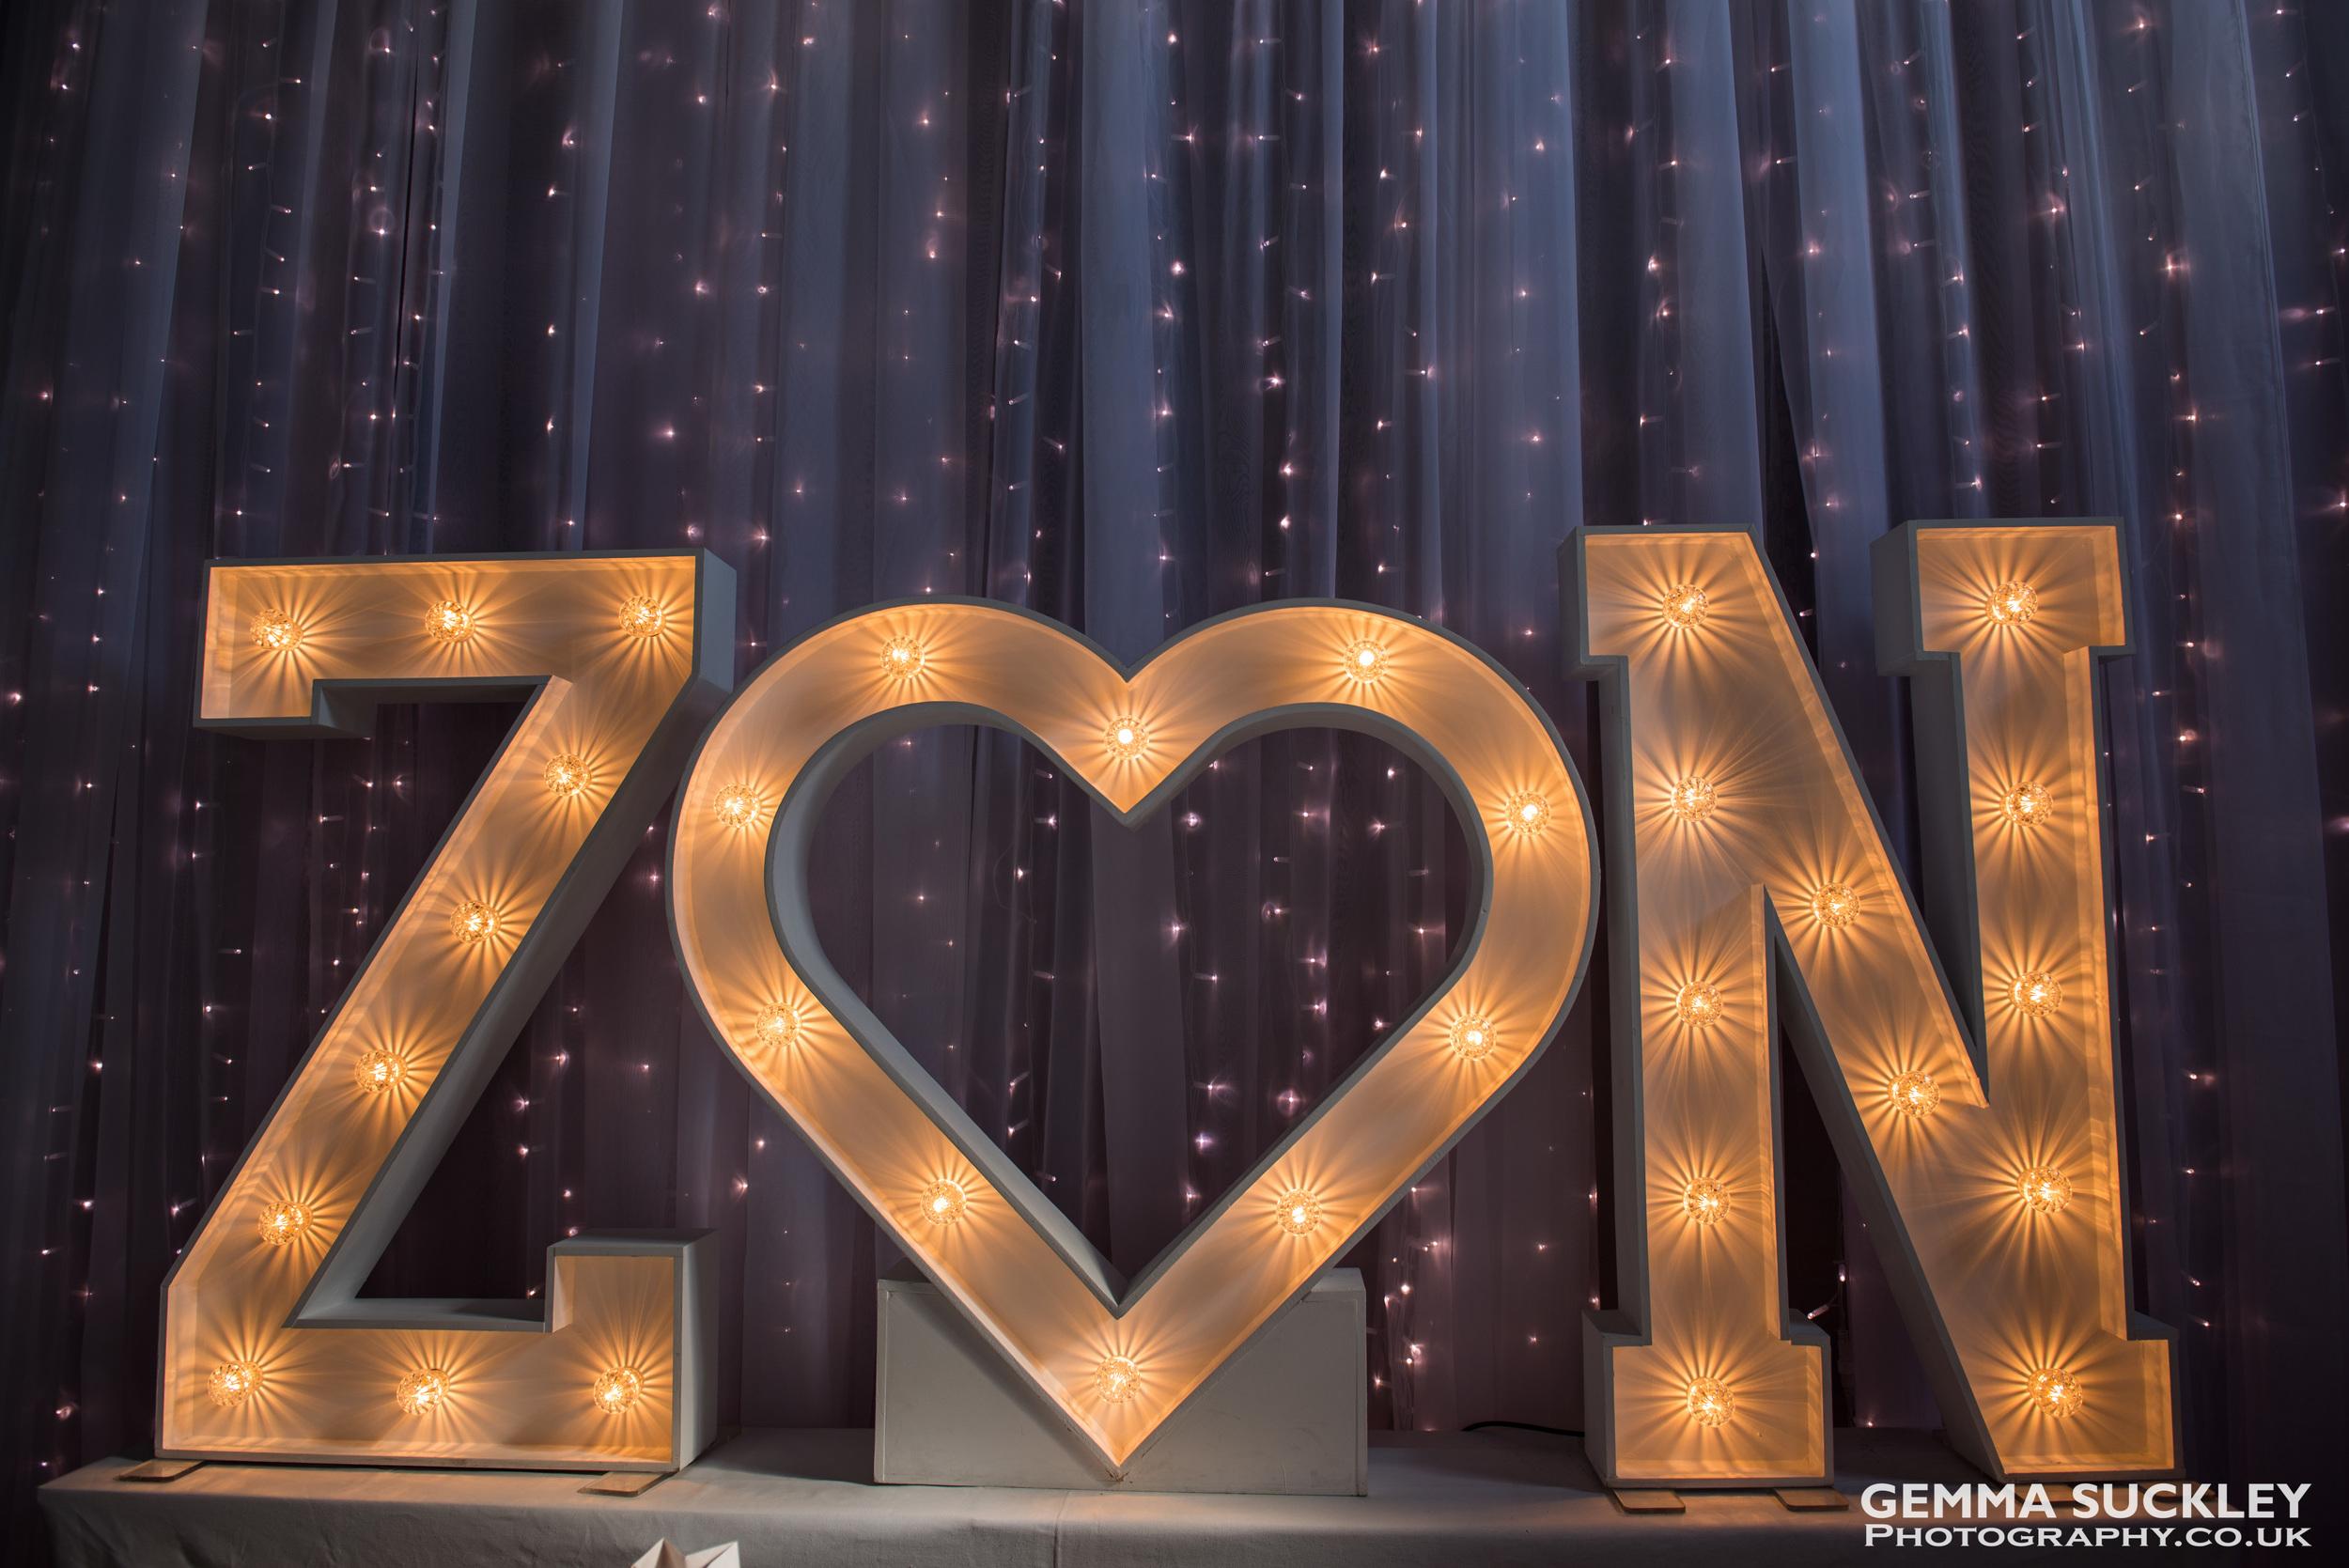 light-up-wedding-letters-gemma-suckley-photography.jpg